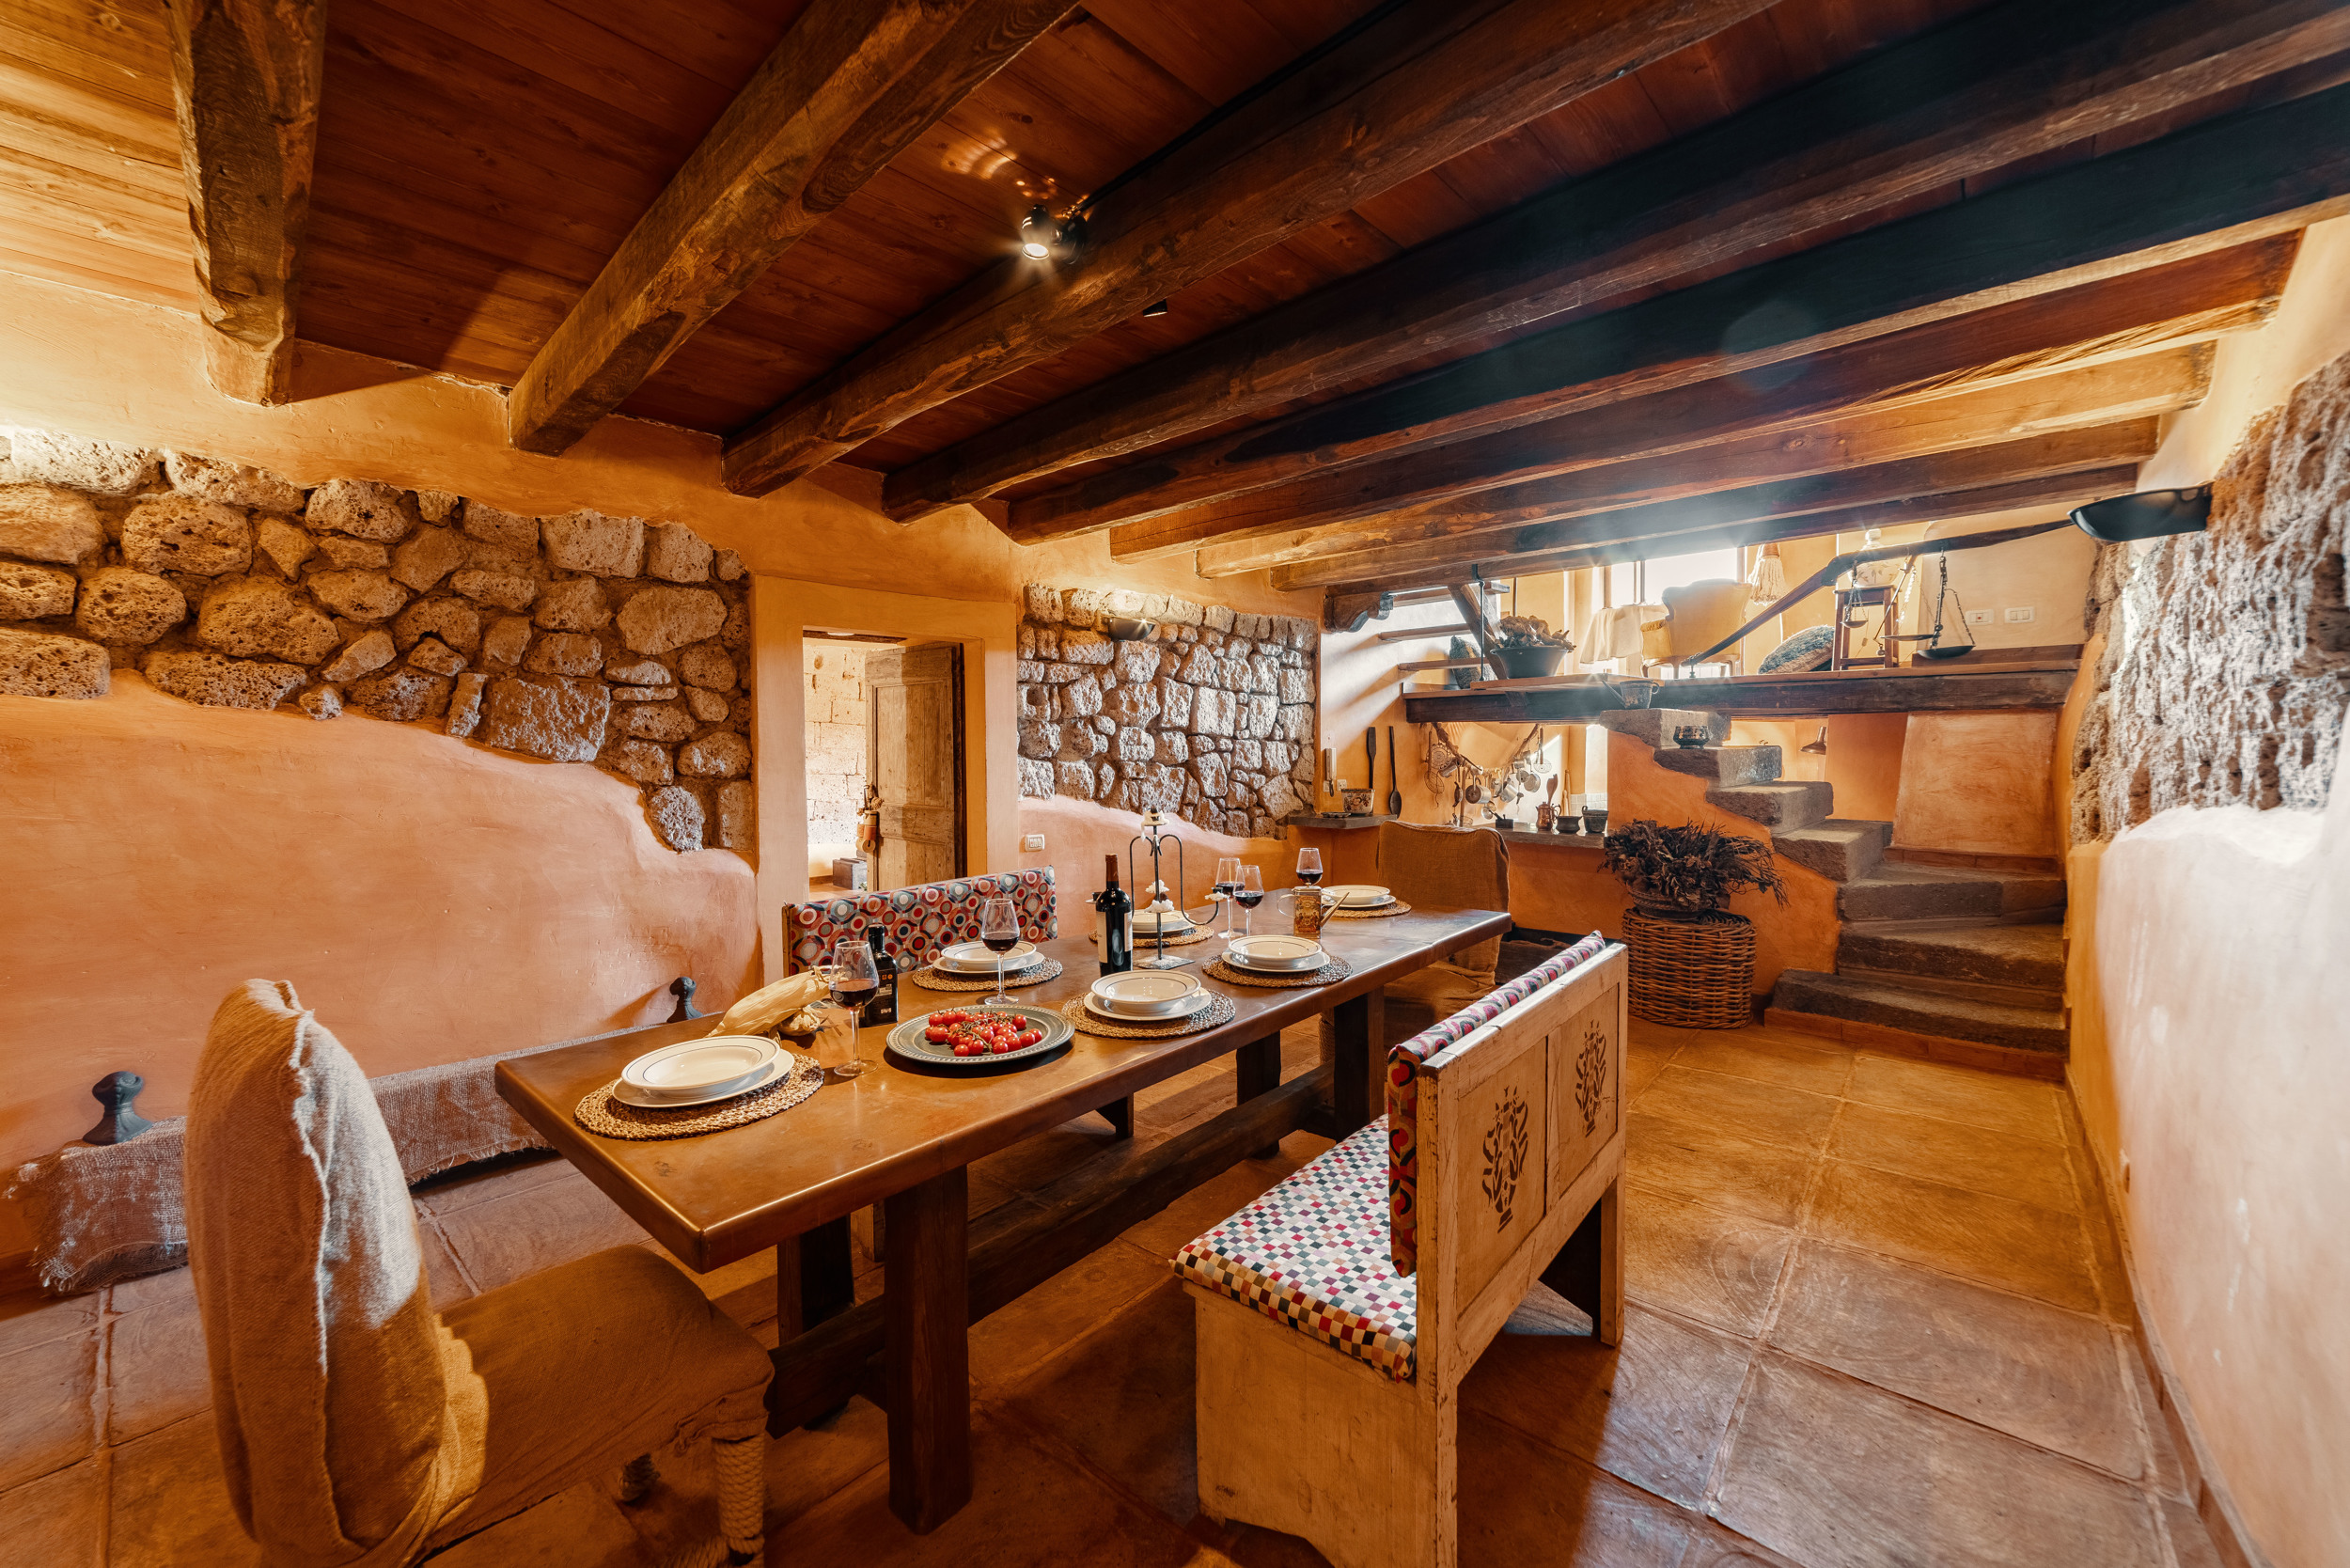 kitchen_diningroom.jpg